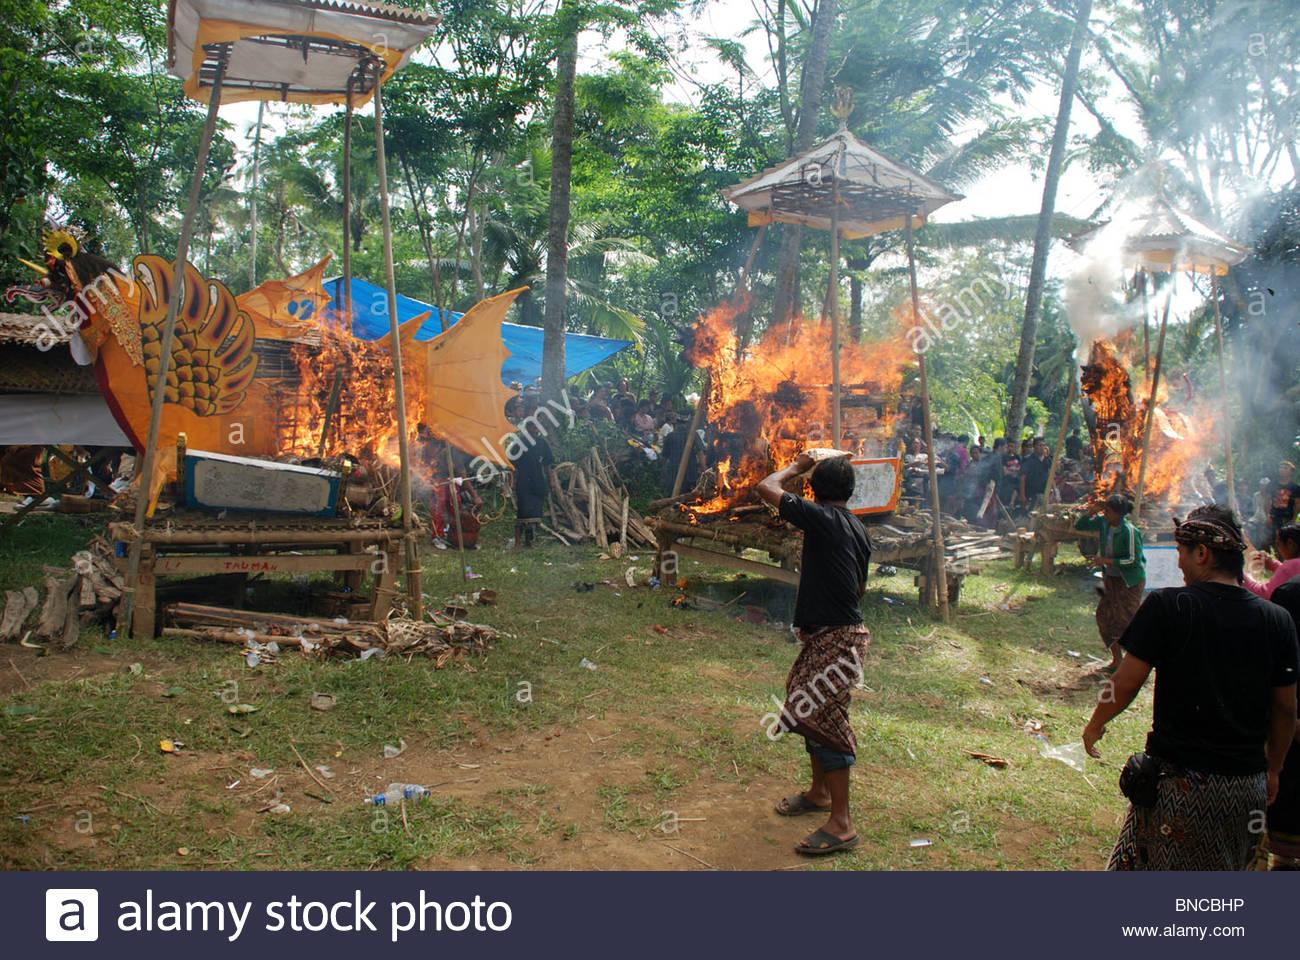 Three ornate coffins burn in mass Hindu cremation ceremony Bangli Bali Indonesia - Stock Image